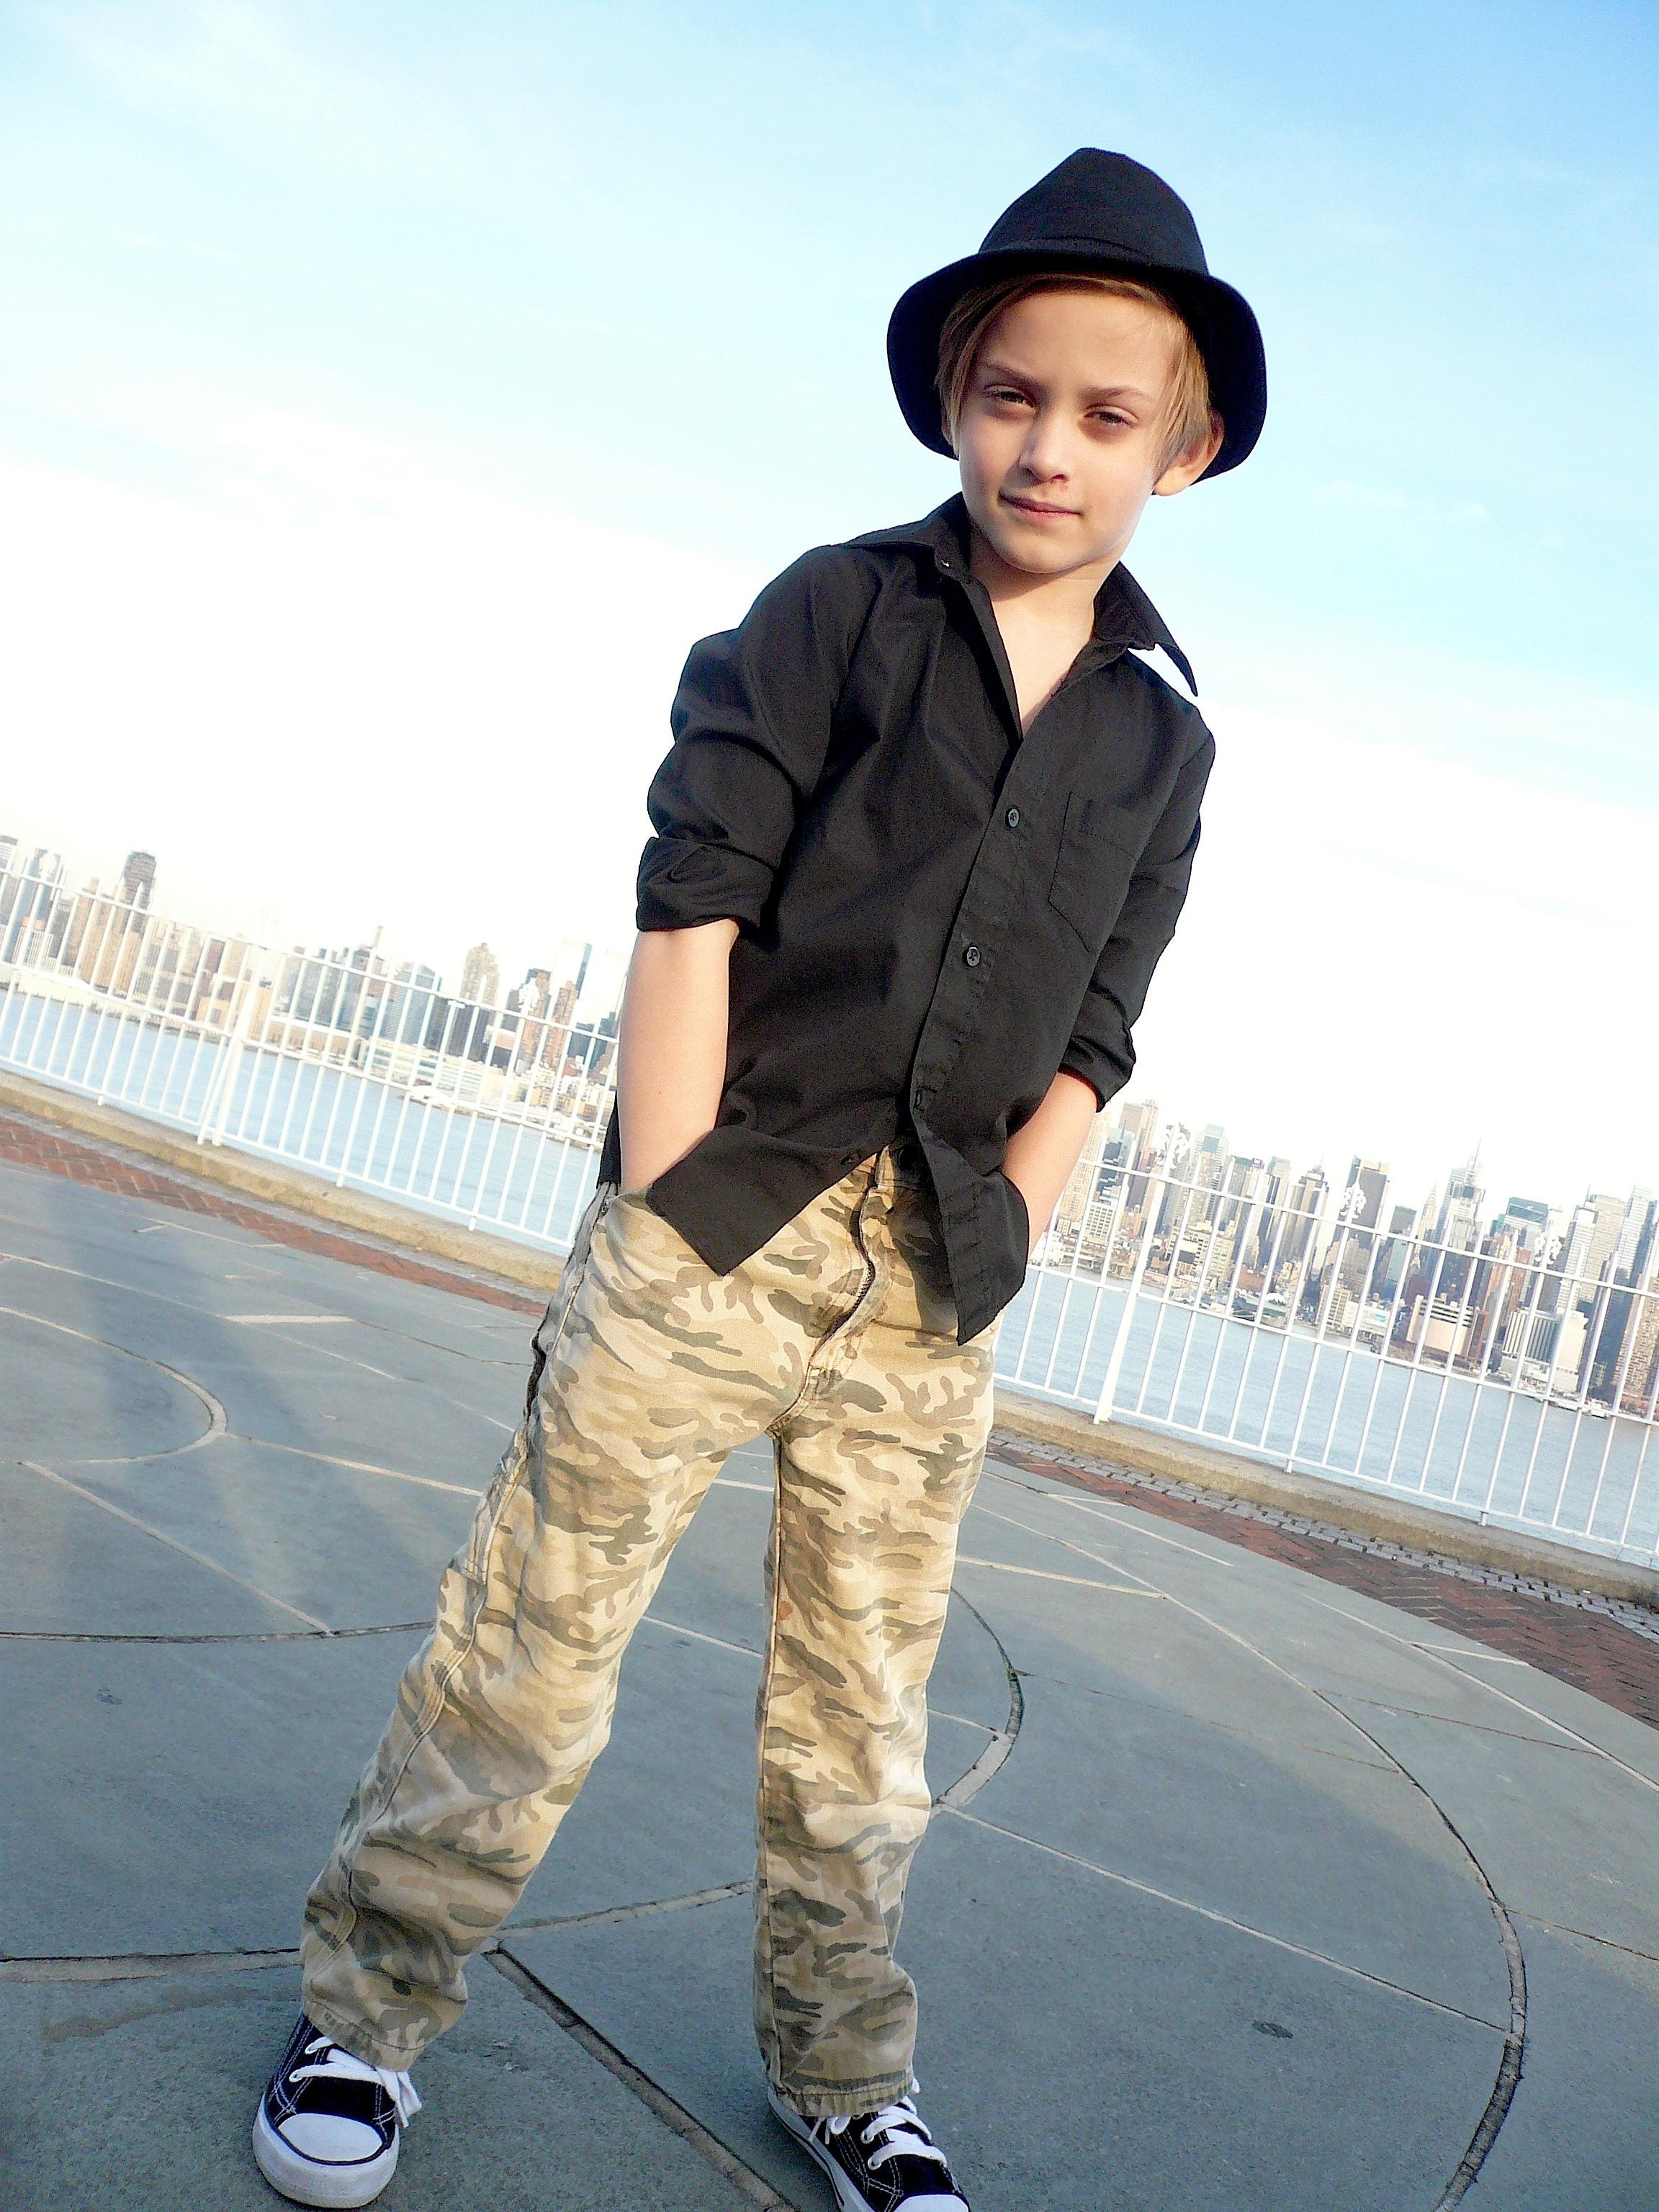 Best Wallpaper Attitude Little Boy - black-full-bdy  Picture_43223.jpg